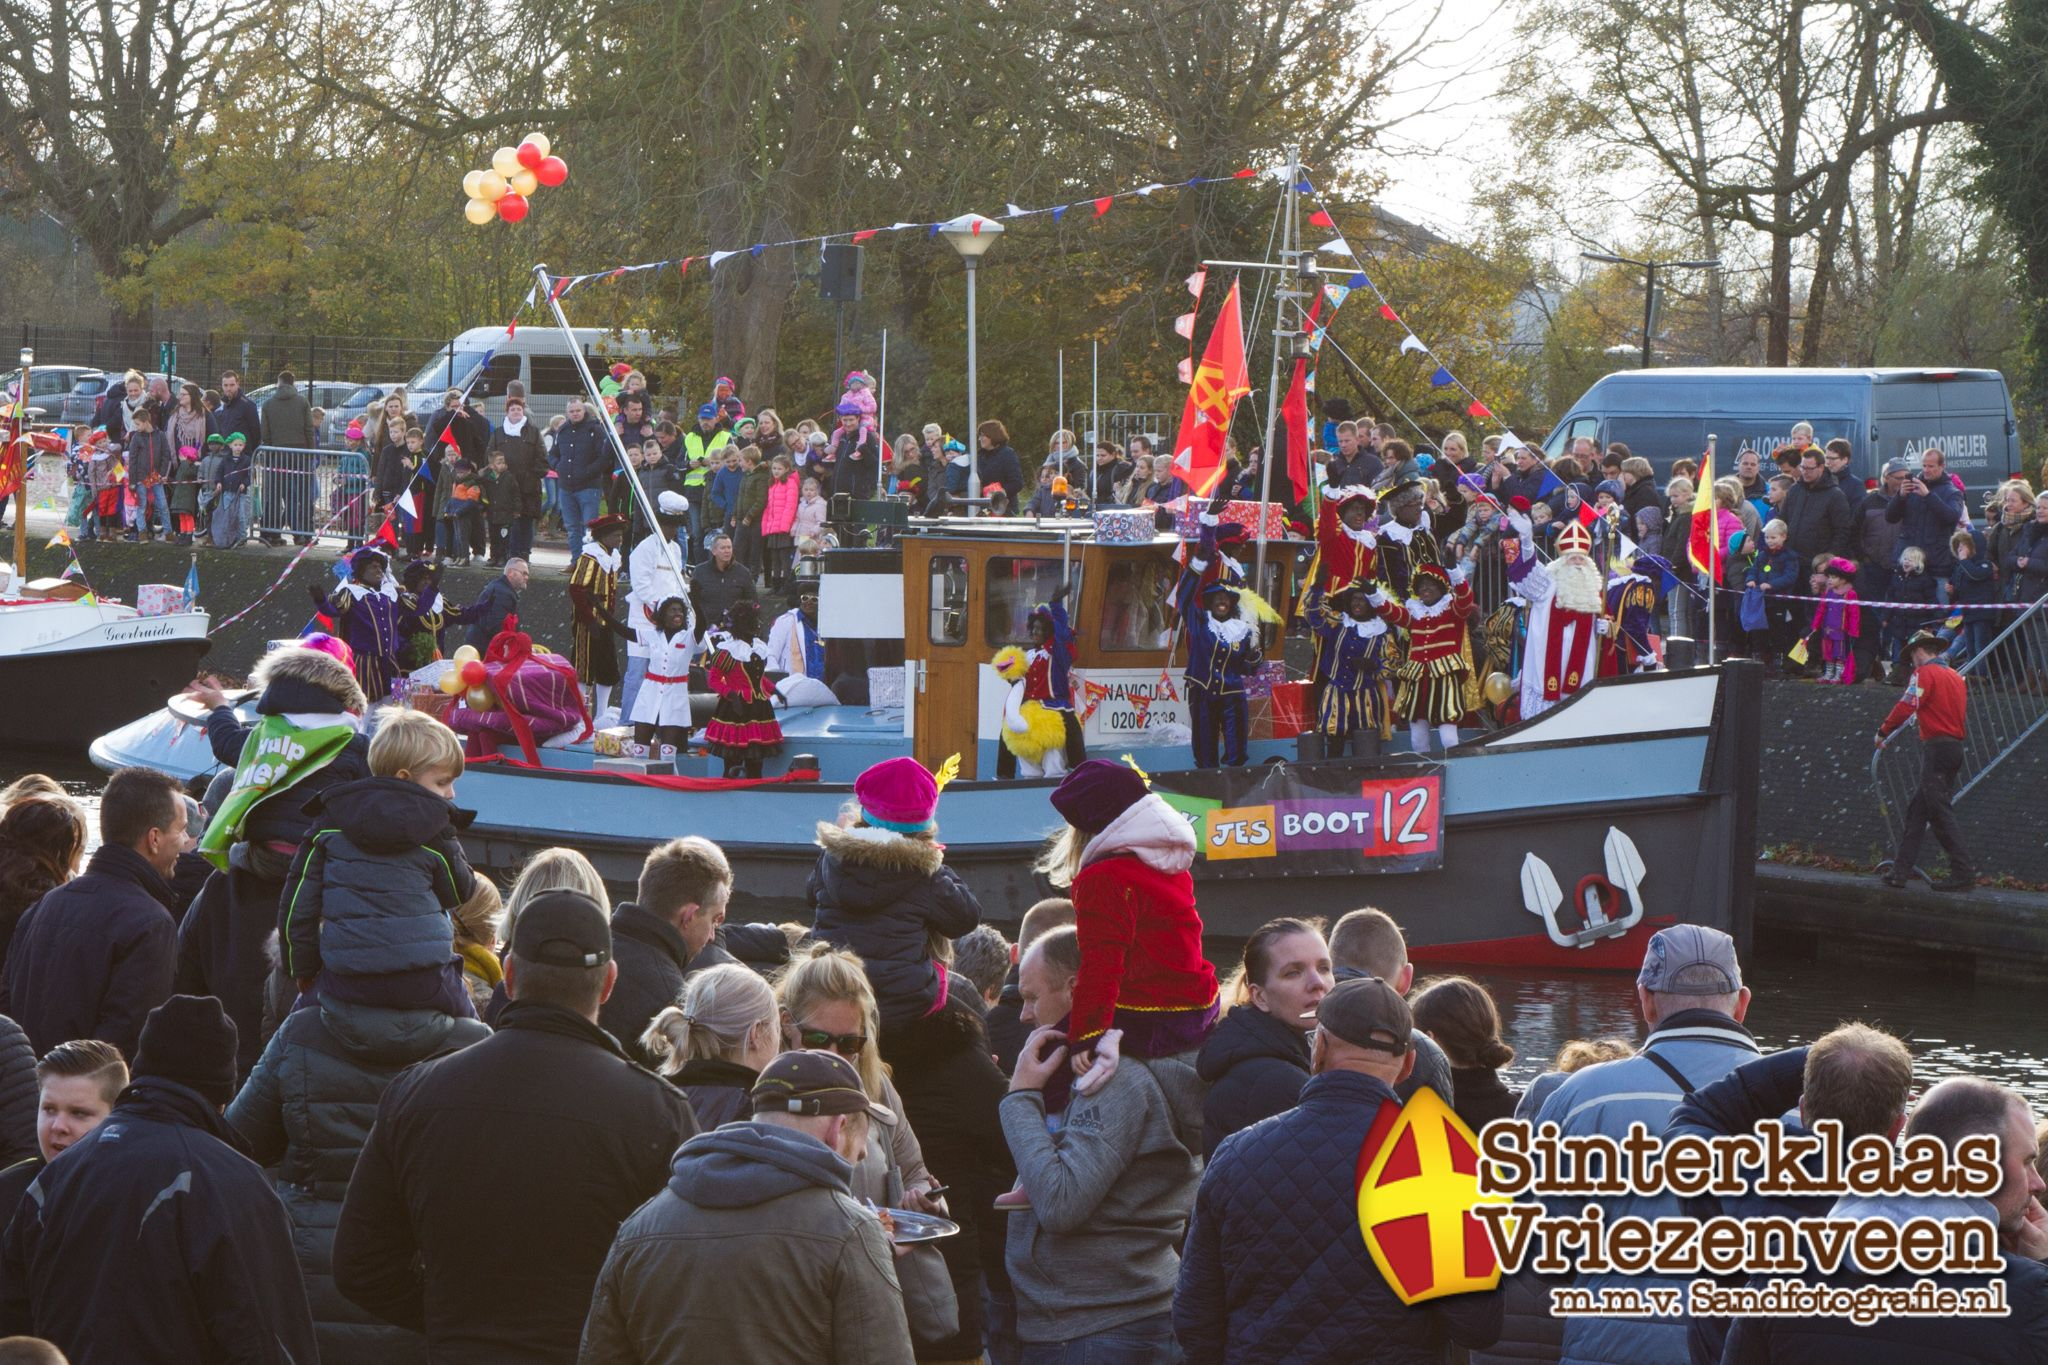 Sinterklaasintocht 18 november 2017 Vriezenveen Sand Fotografie